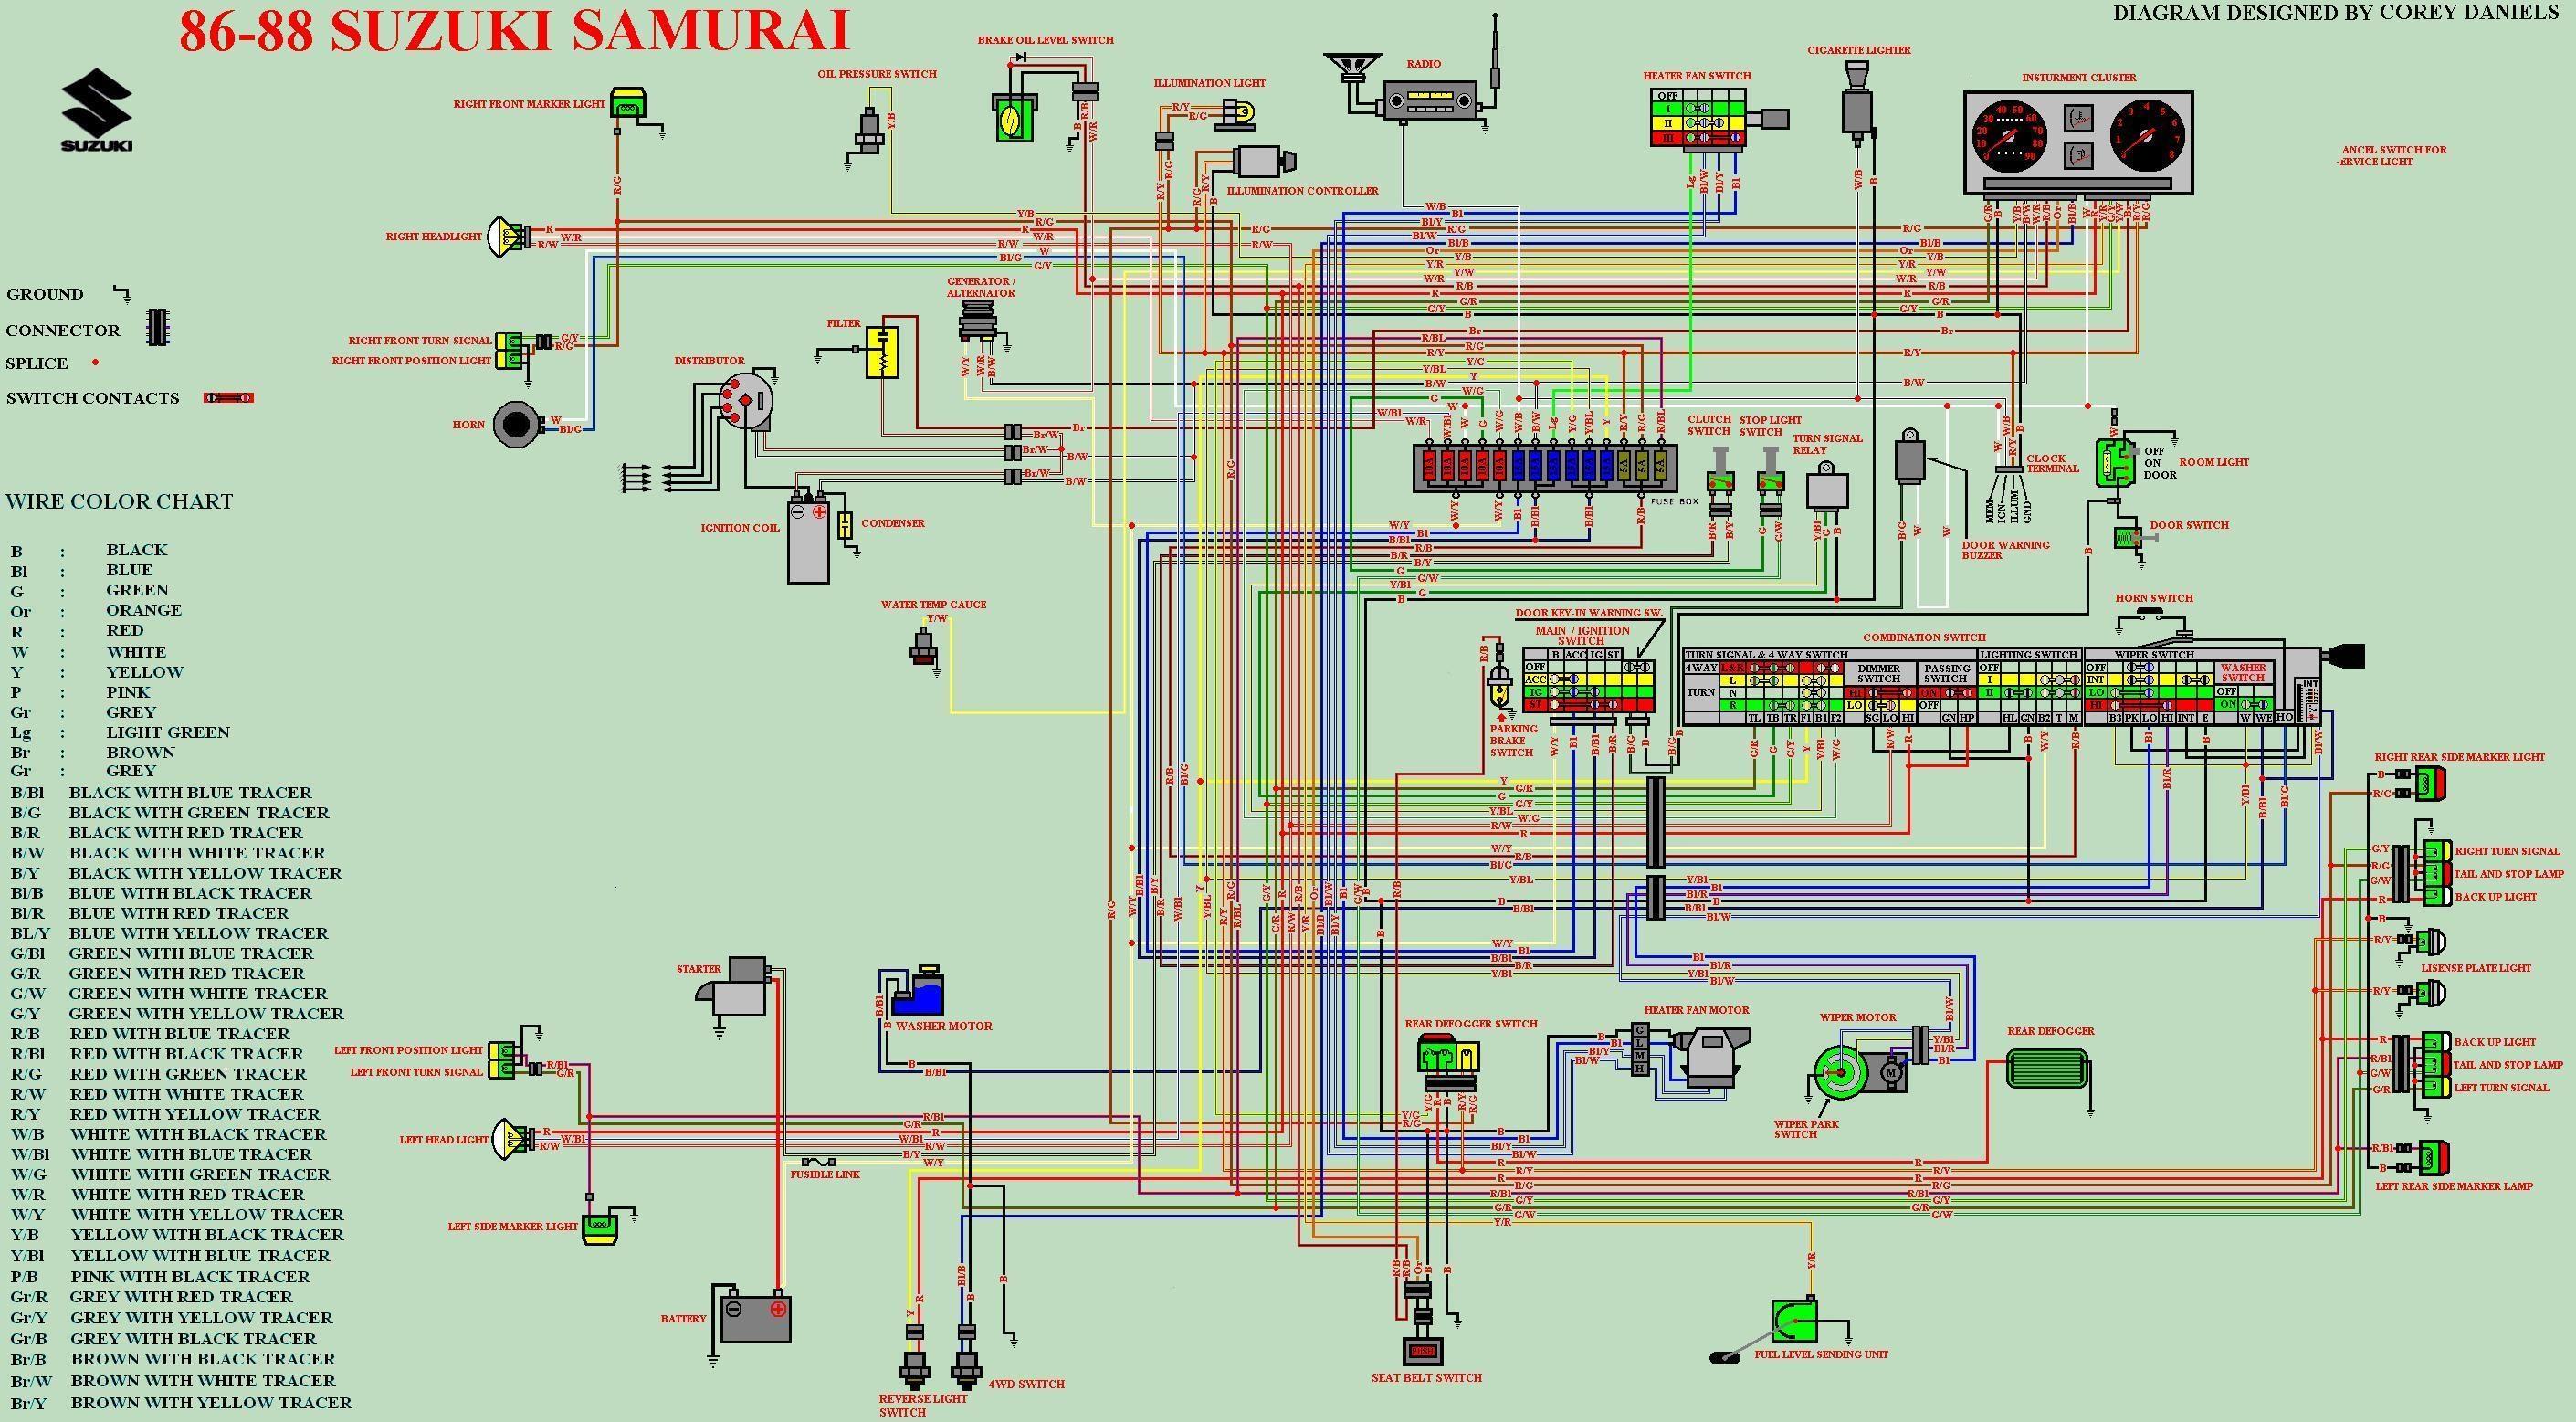 wiring diagram for 1988 suzuki samurai